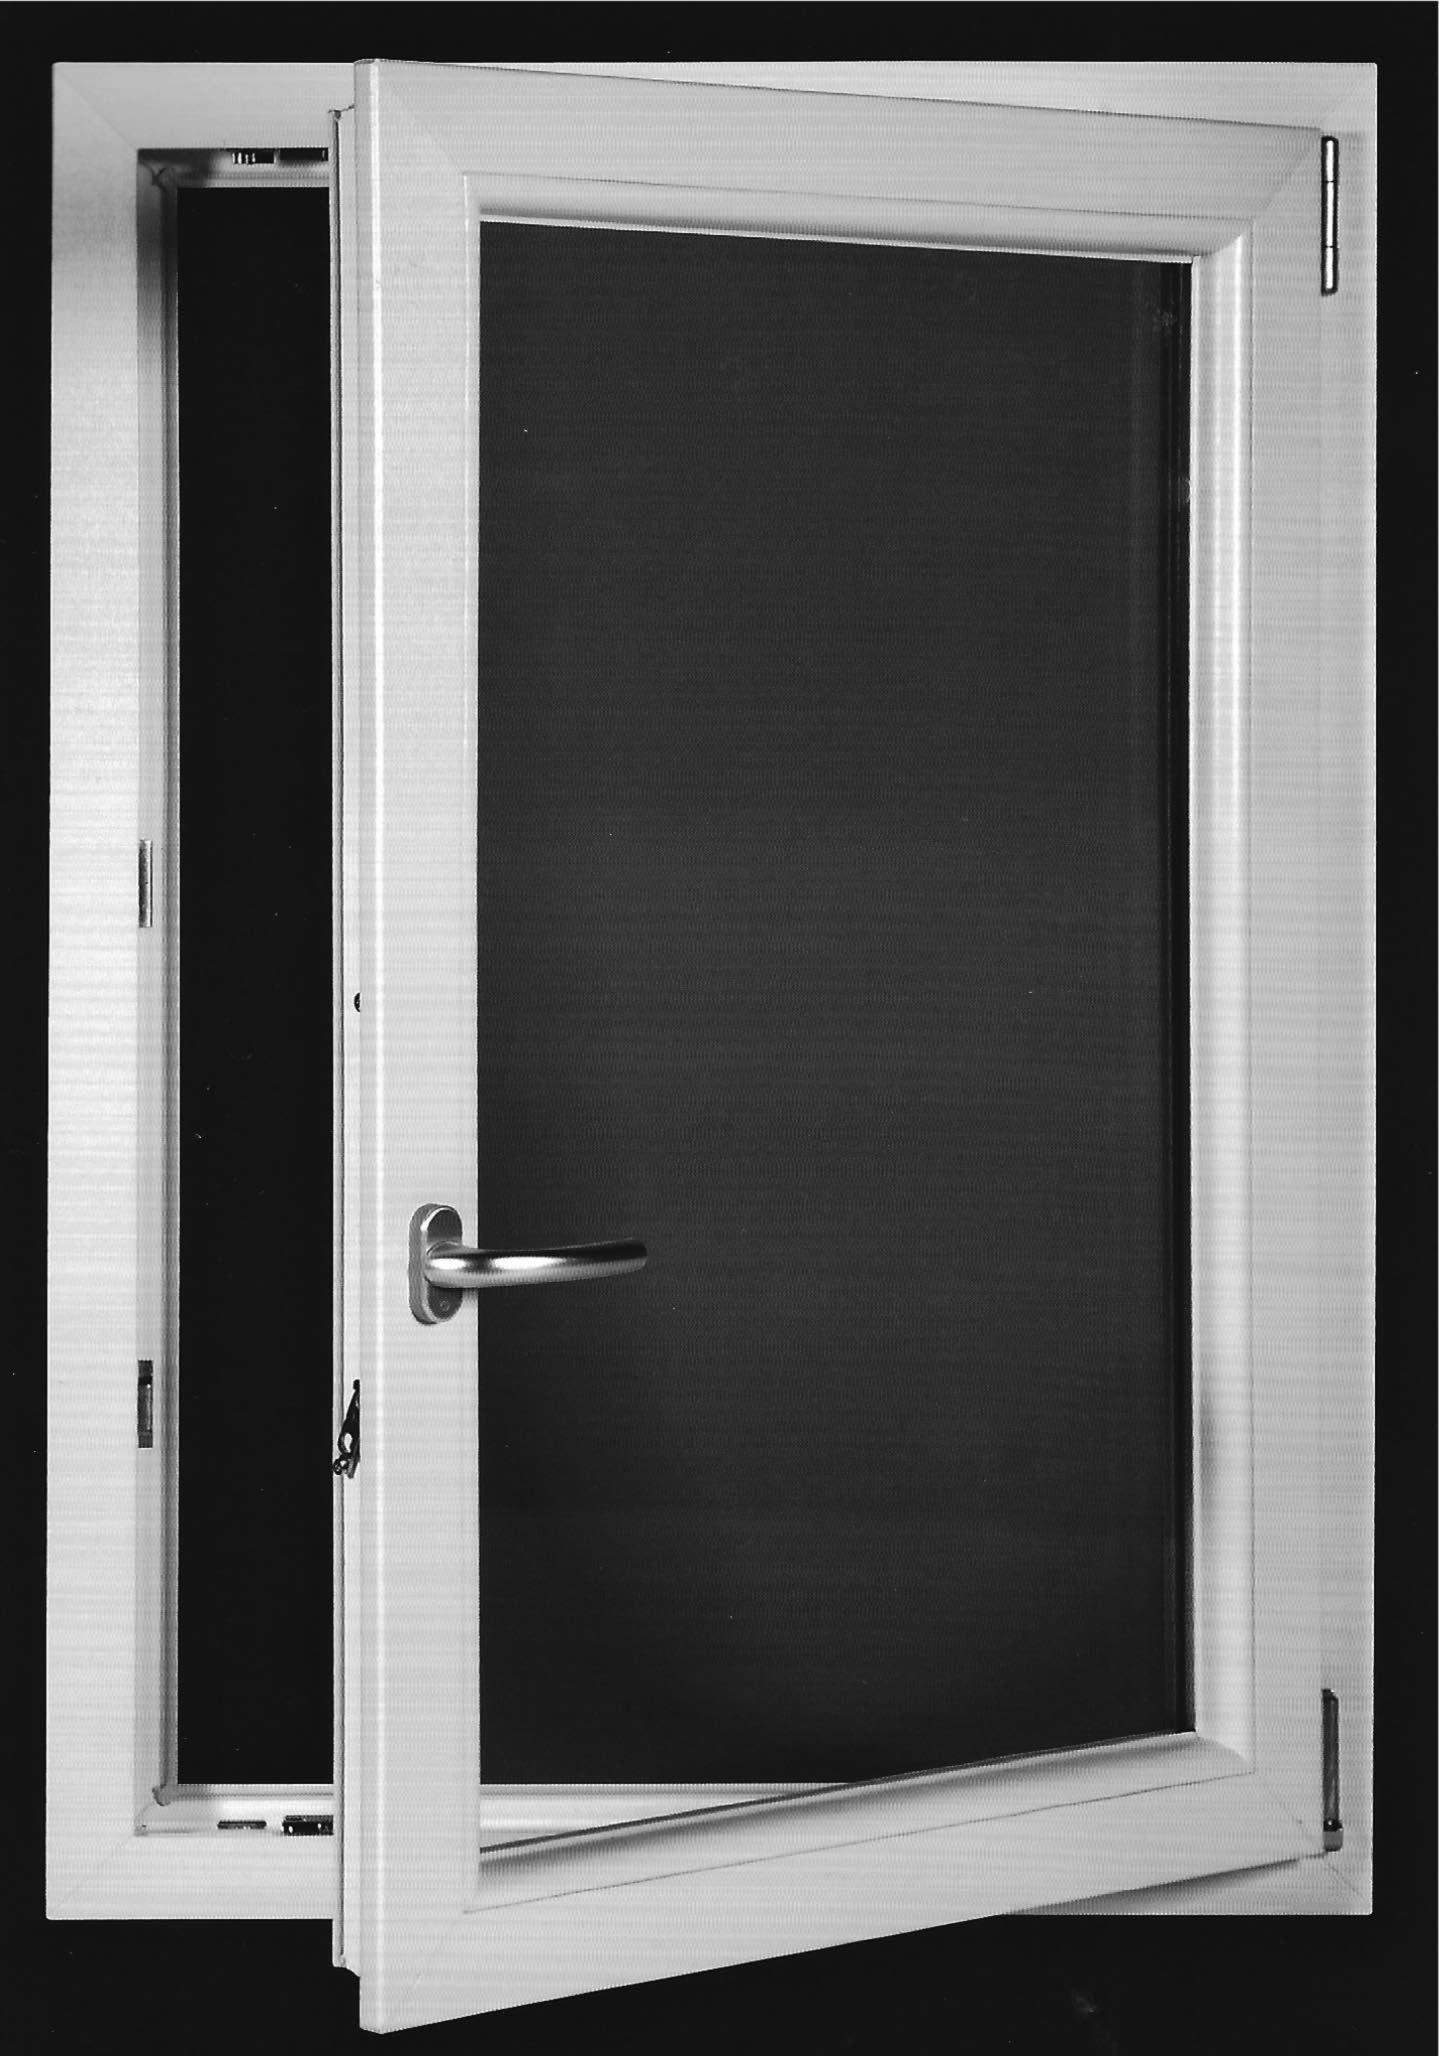 Cm serramenti turate co cm serramenti porte finestre e serramenti - Finestre pvc misure standard ...